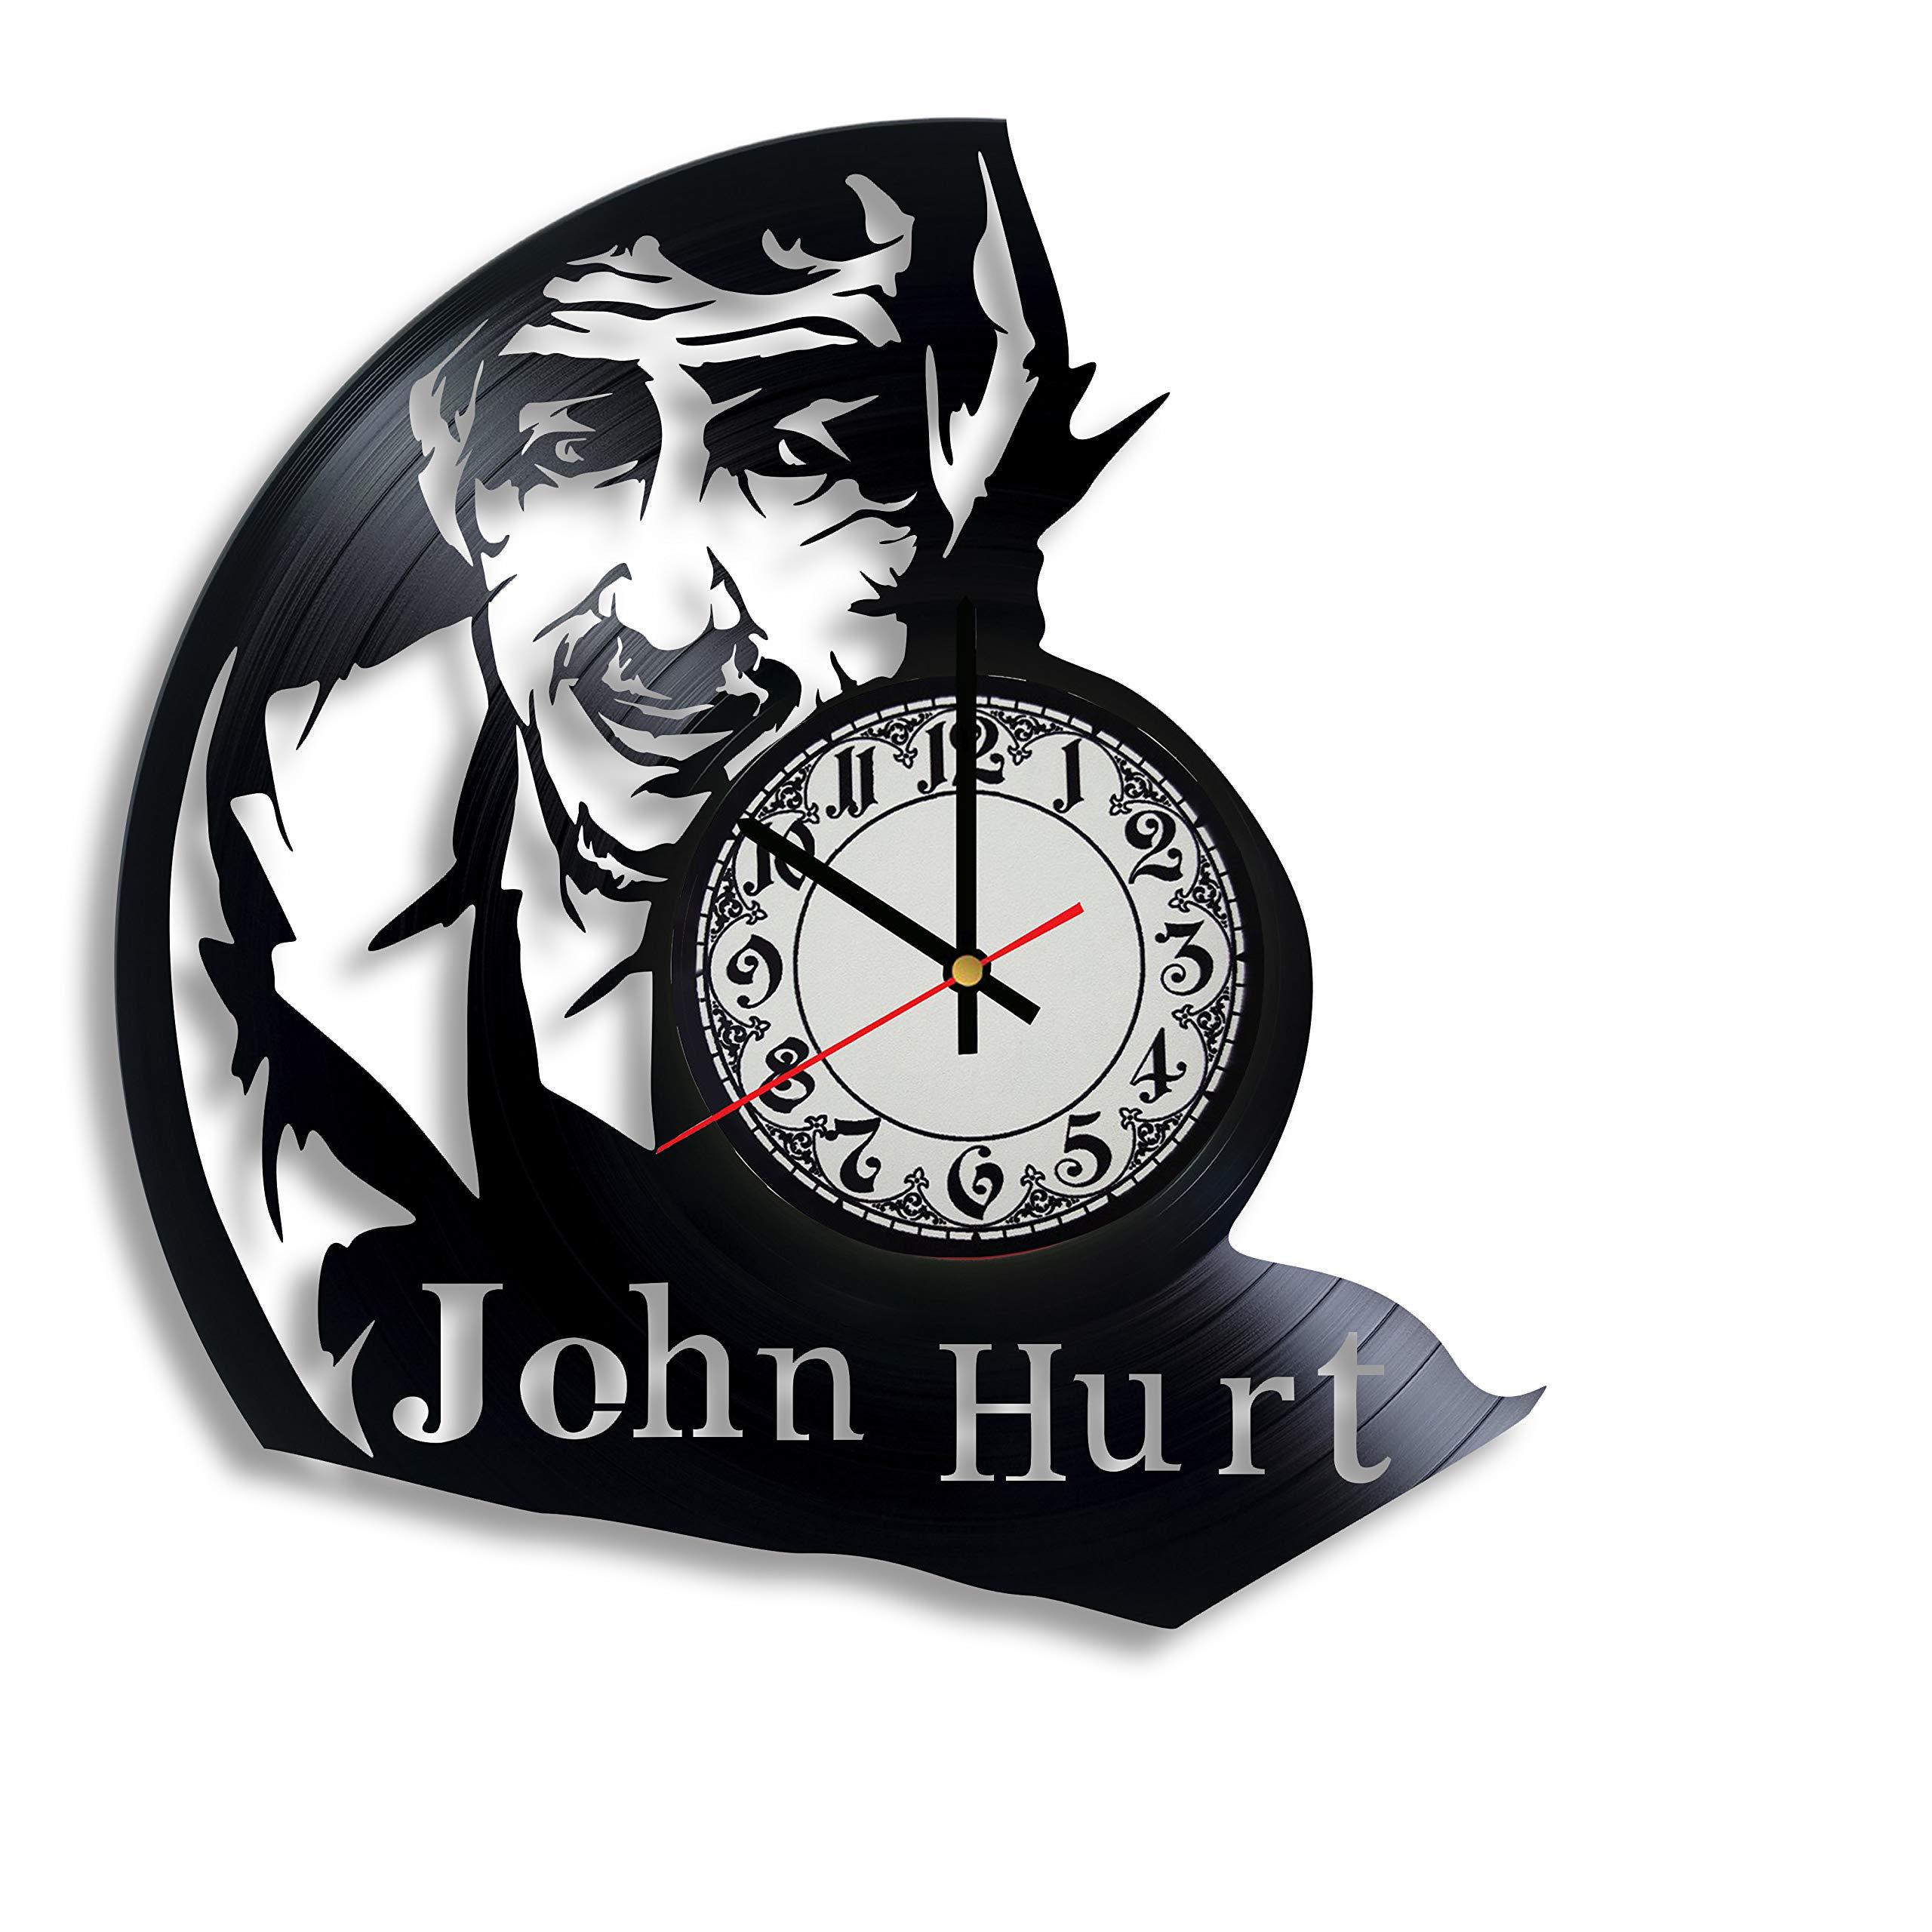 Amazon.com: John Hurt Actor Handmade Vinyl Record Wall Clock, Get